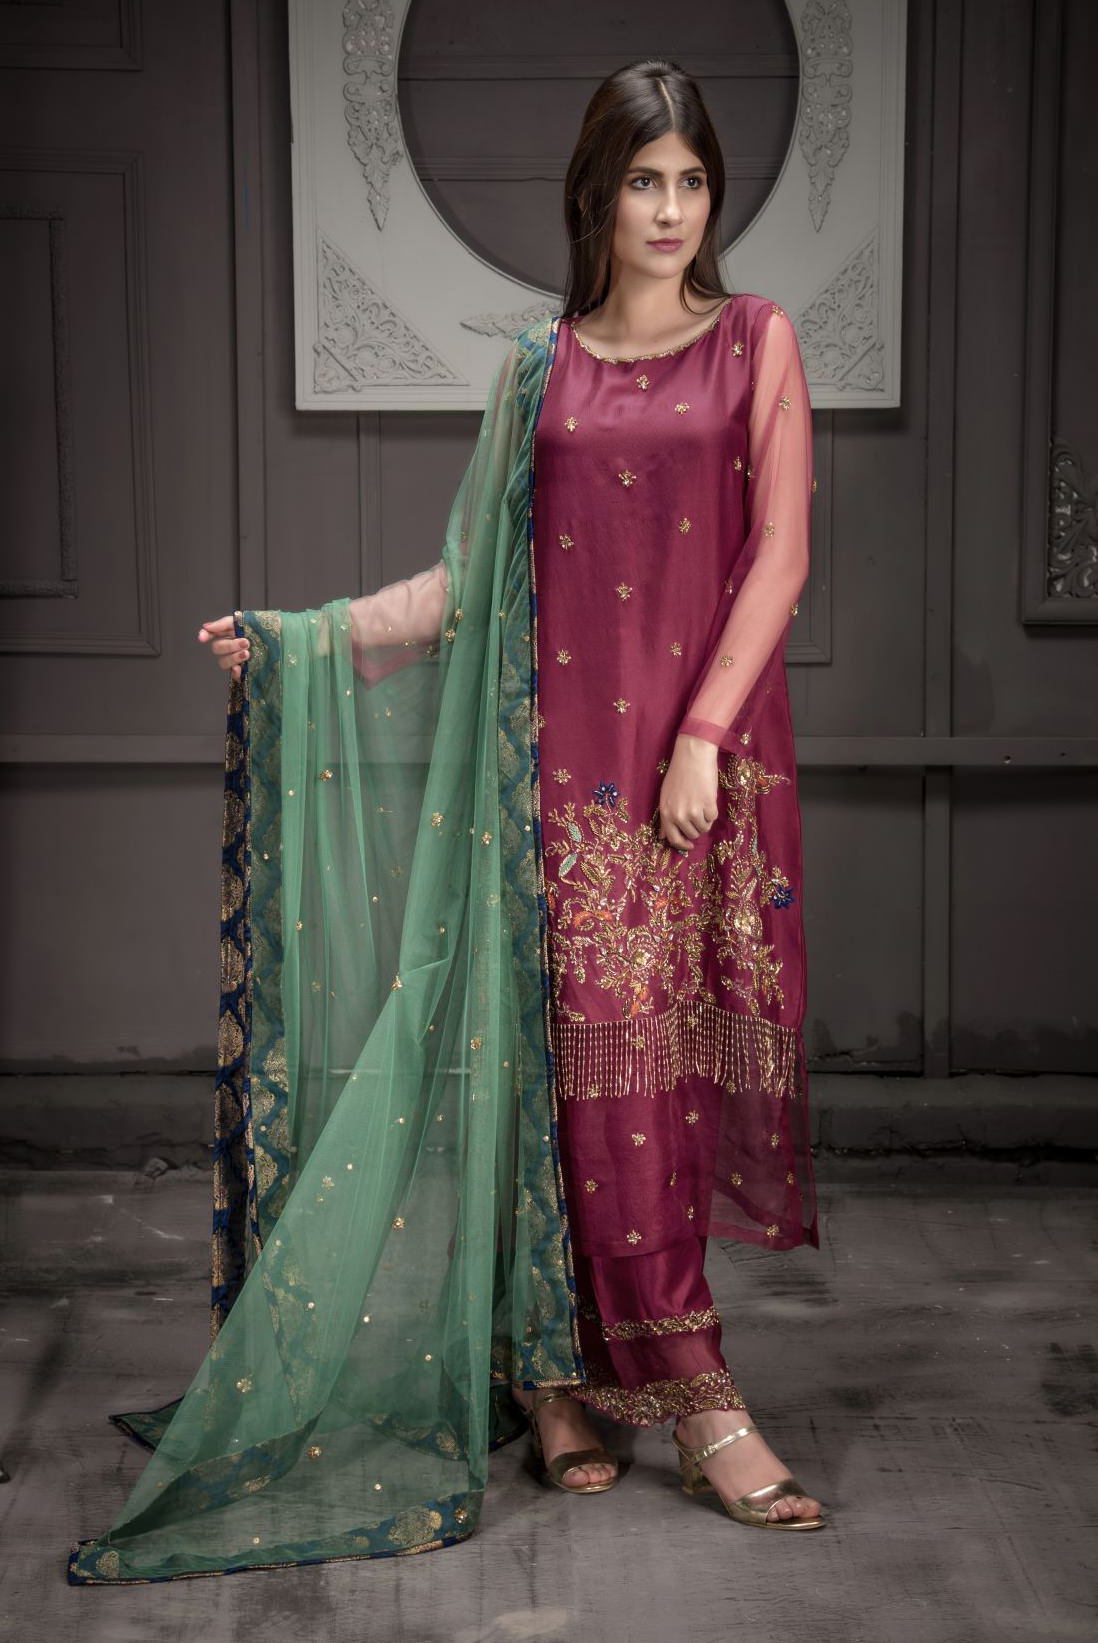 Buy Exclusive Malaga Bridal Wear – Aqbd12 Online In USA, Uk & Pakistan